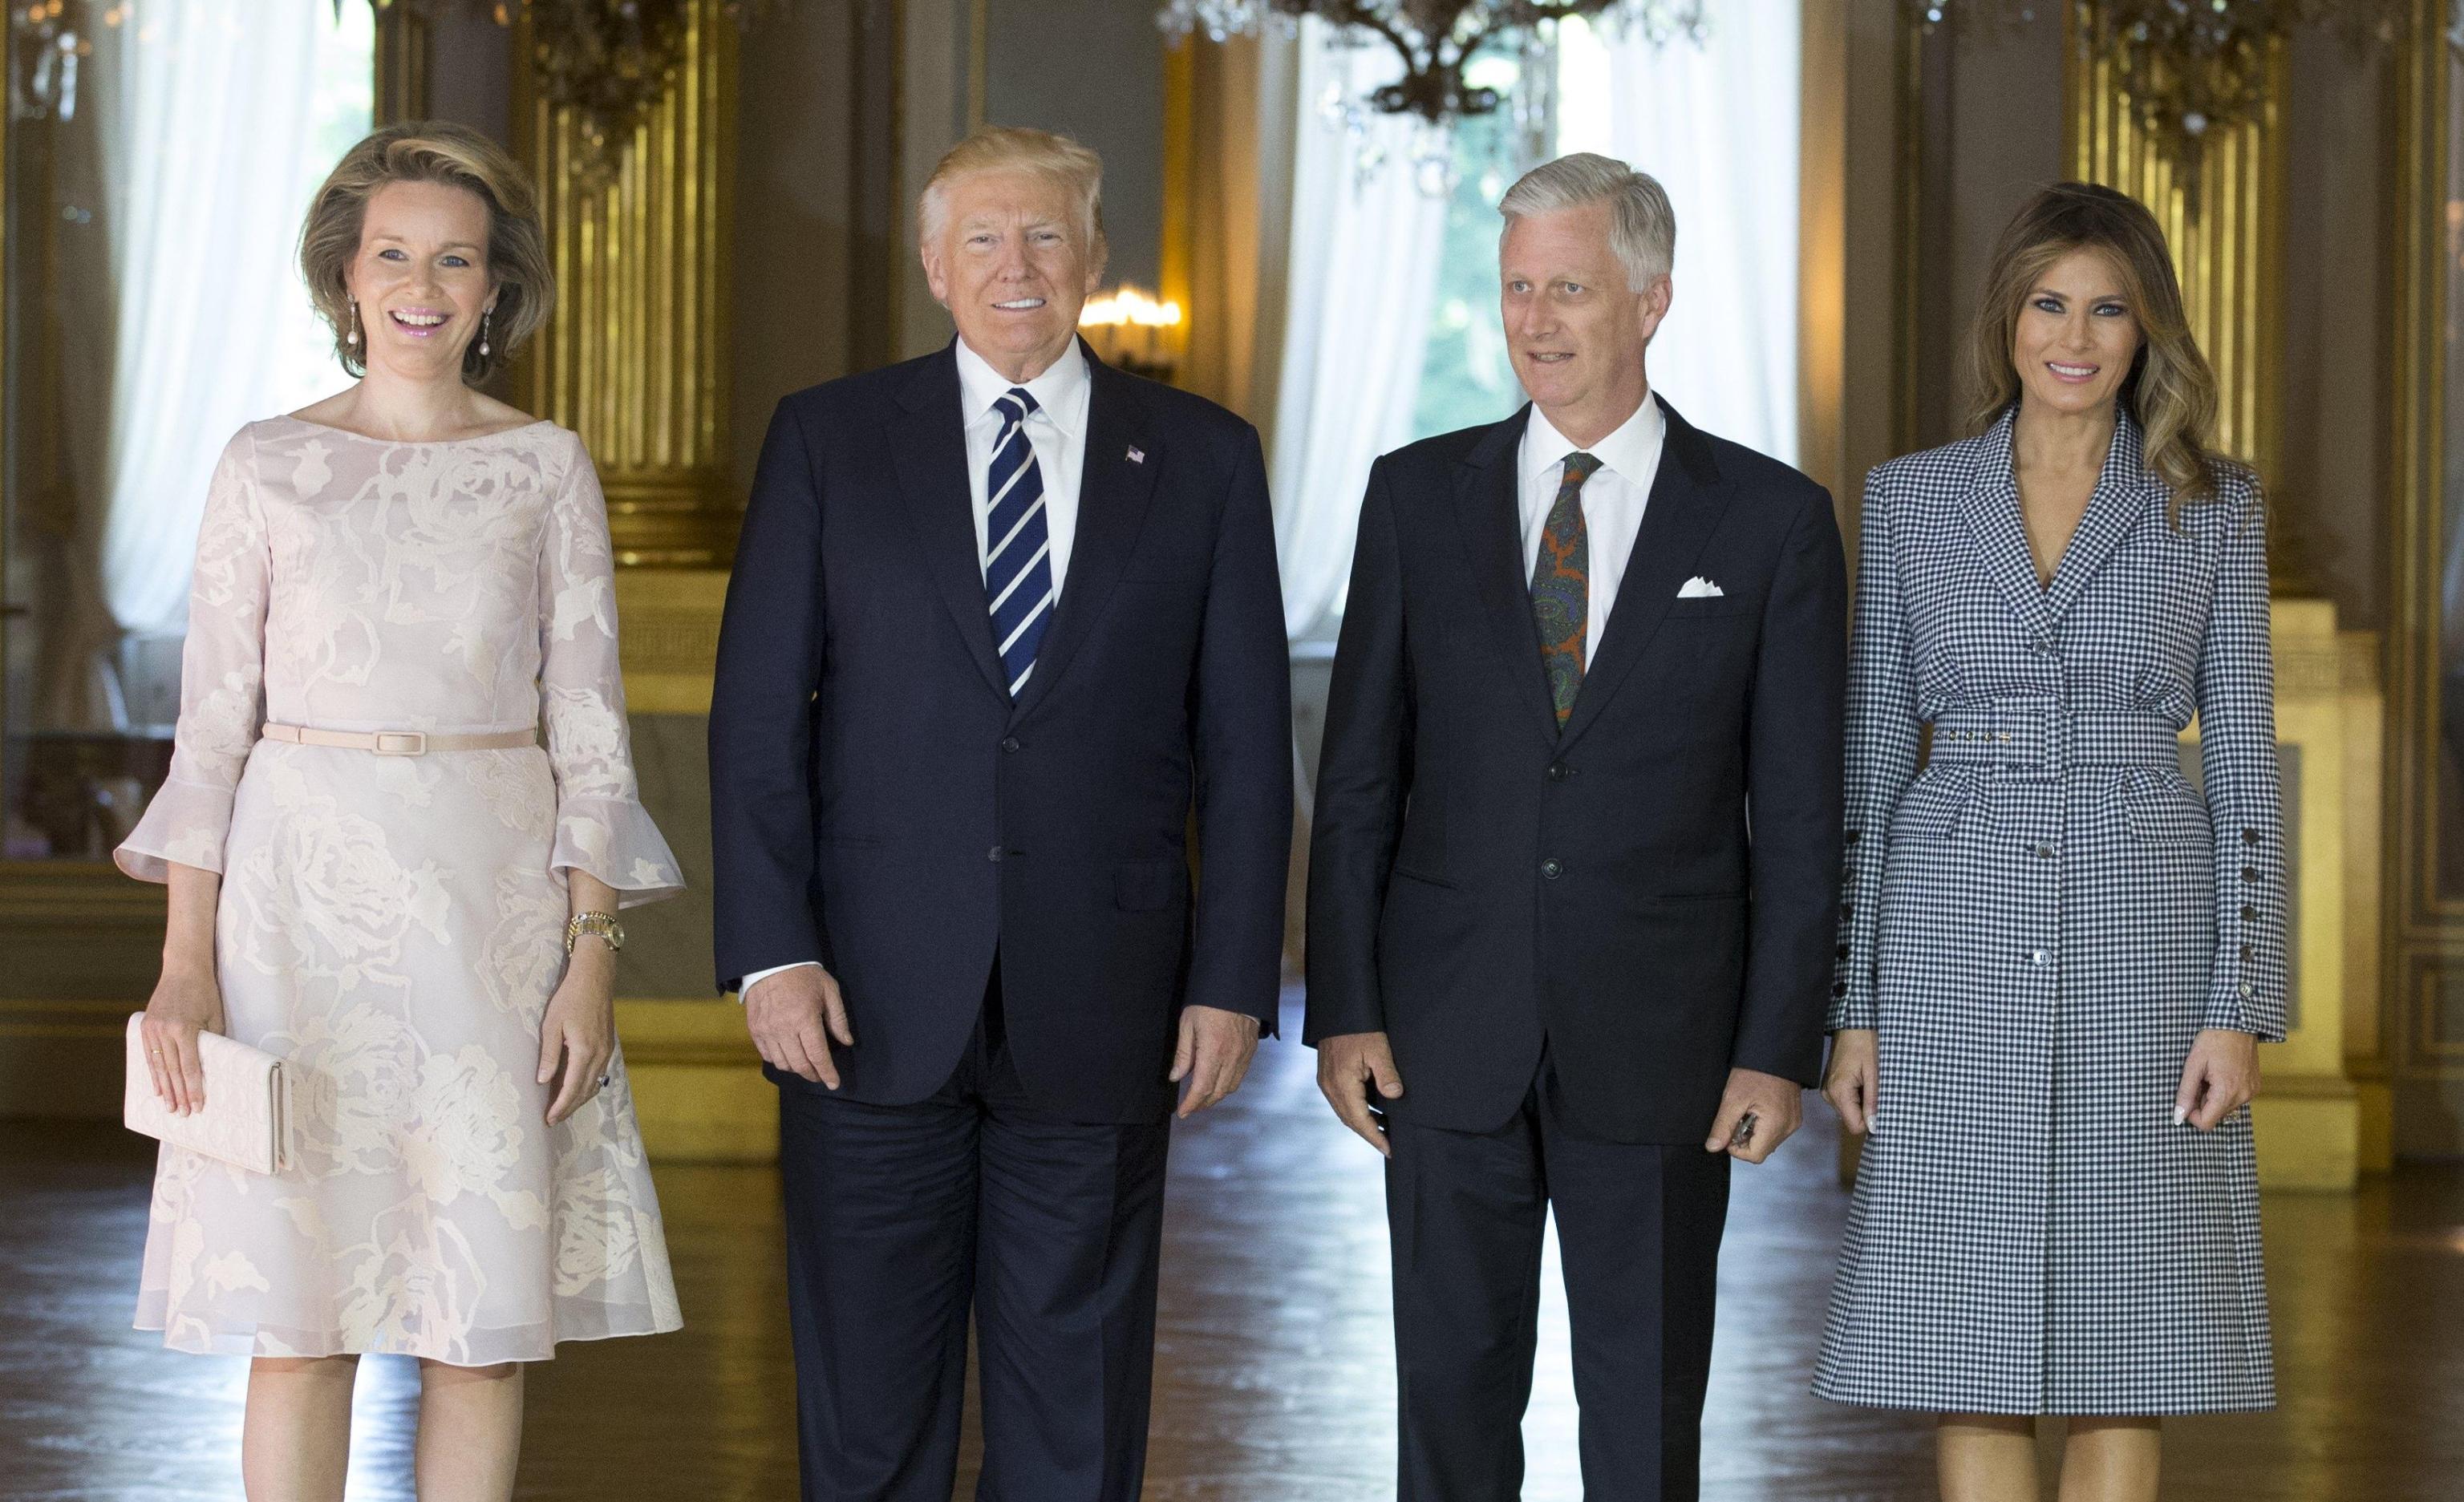 US President Donald J. Trump visits Belgium